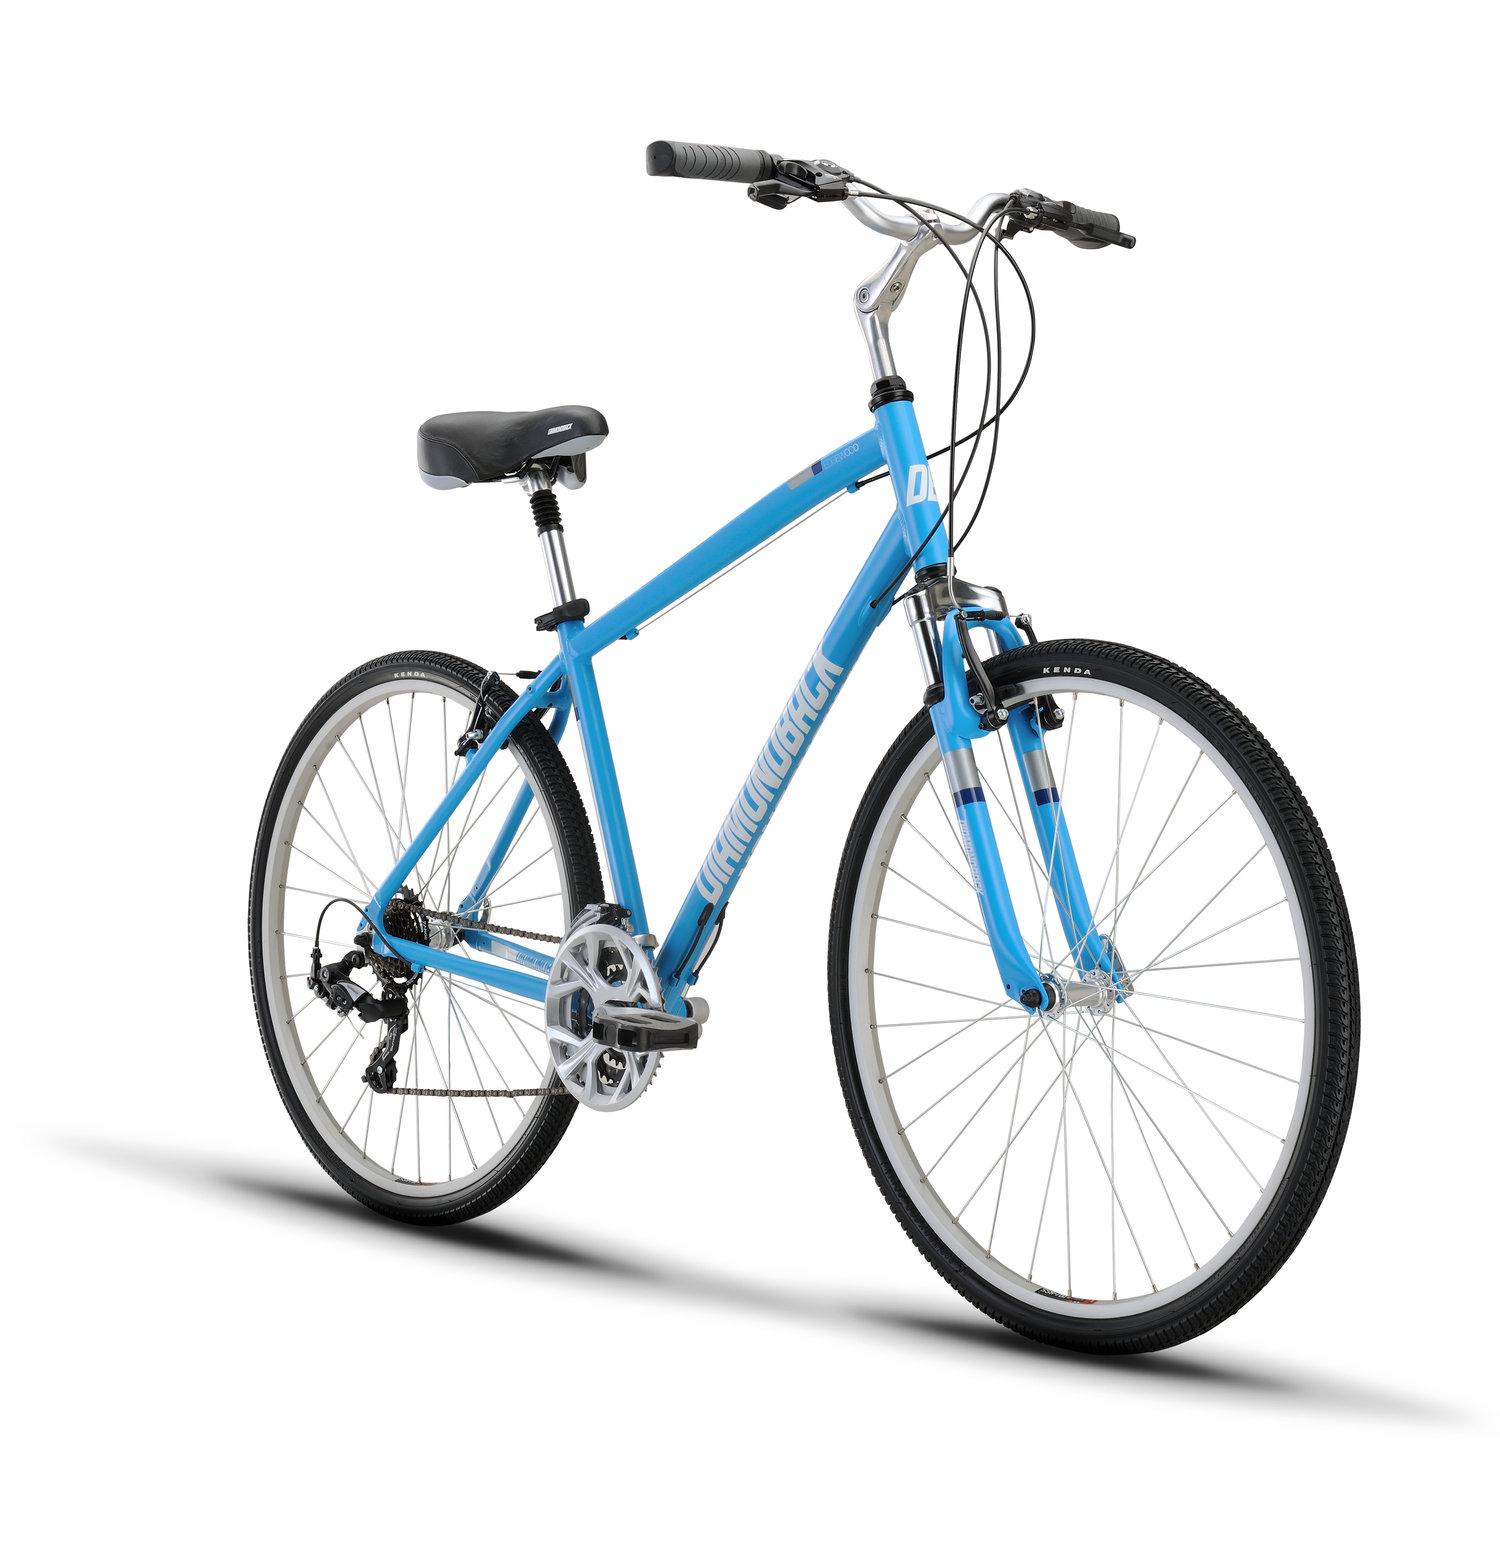 City Bikes 17 Edgewood Cyn angle